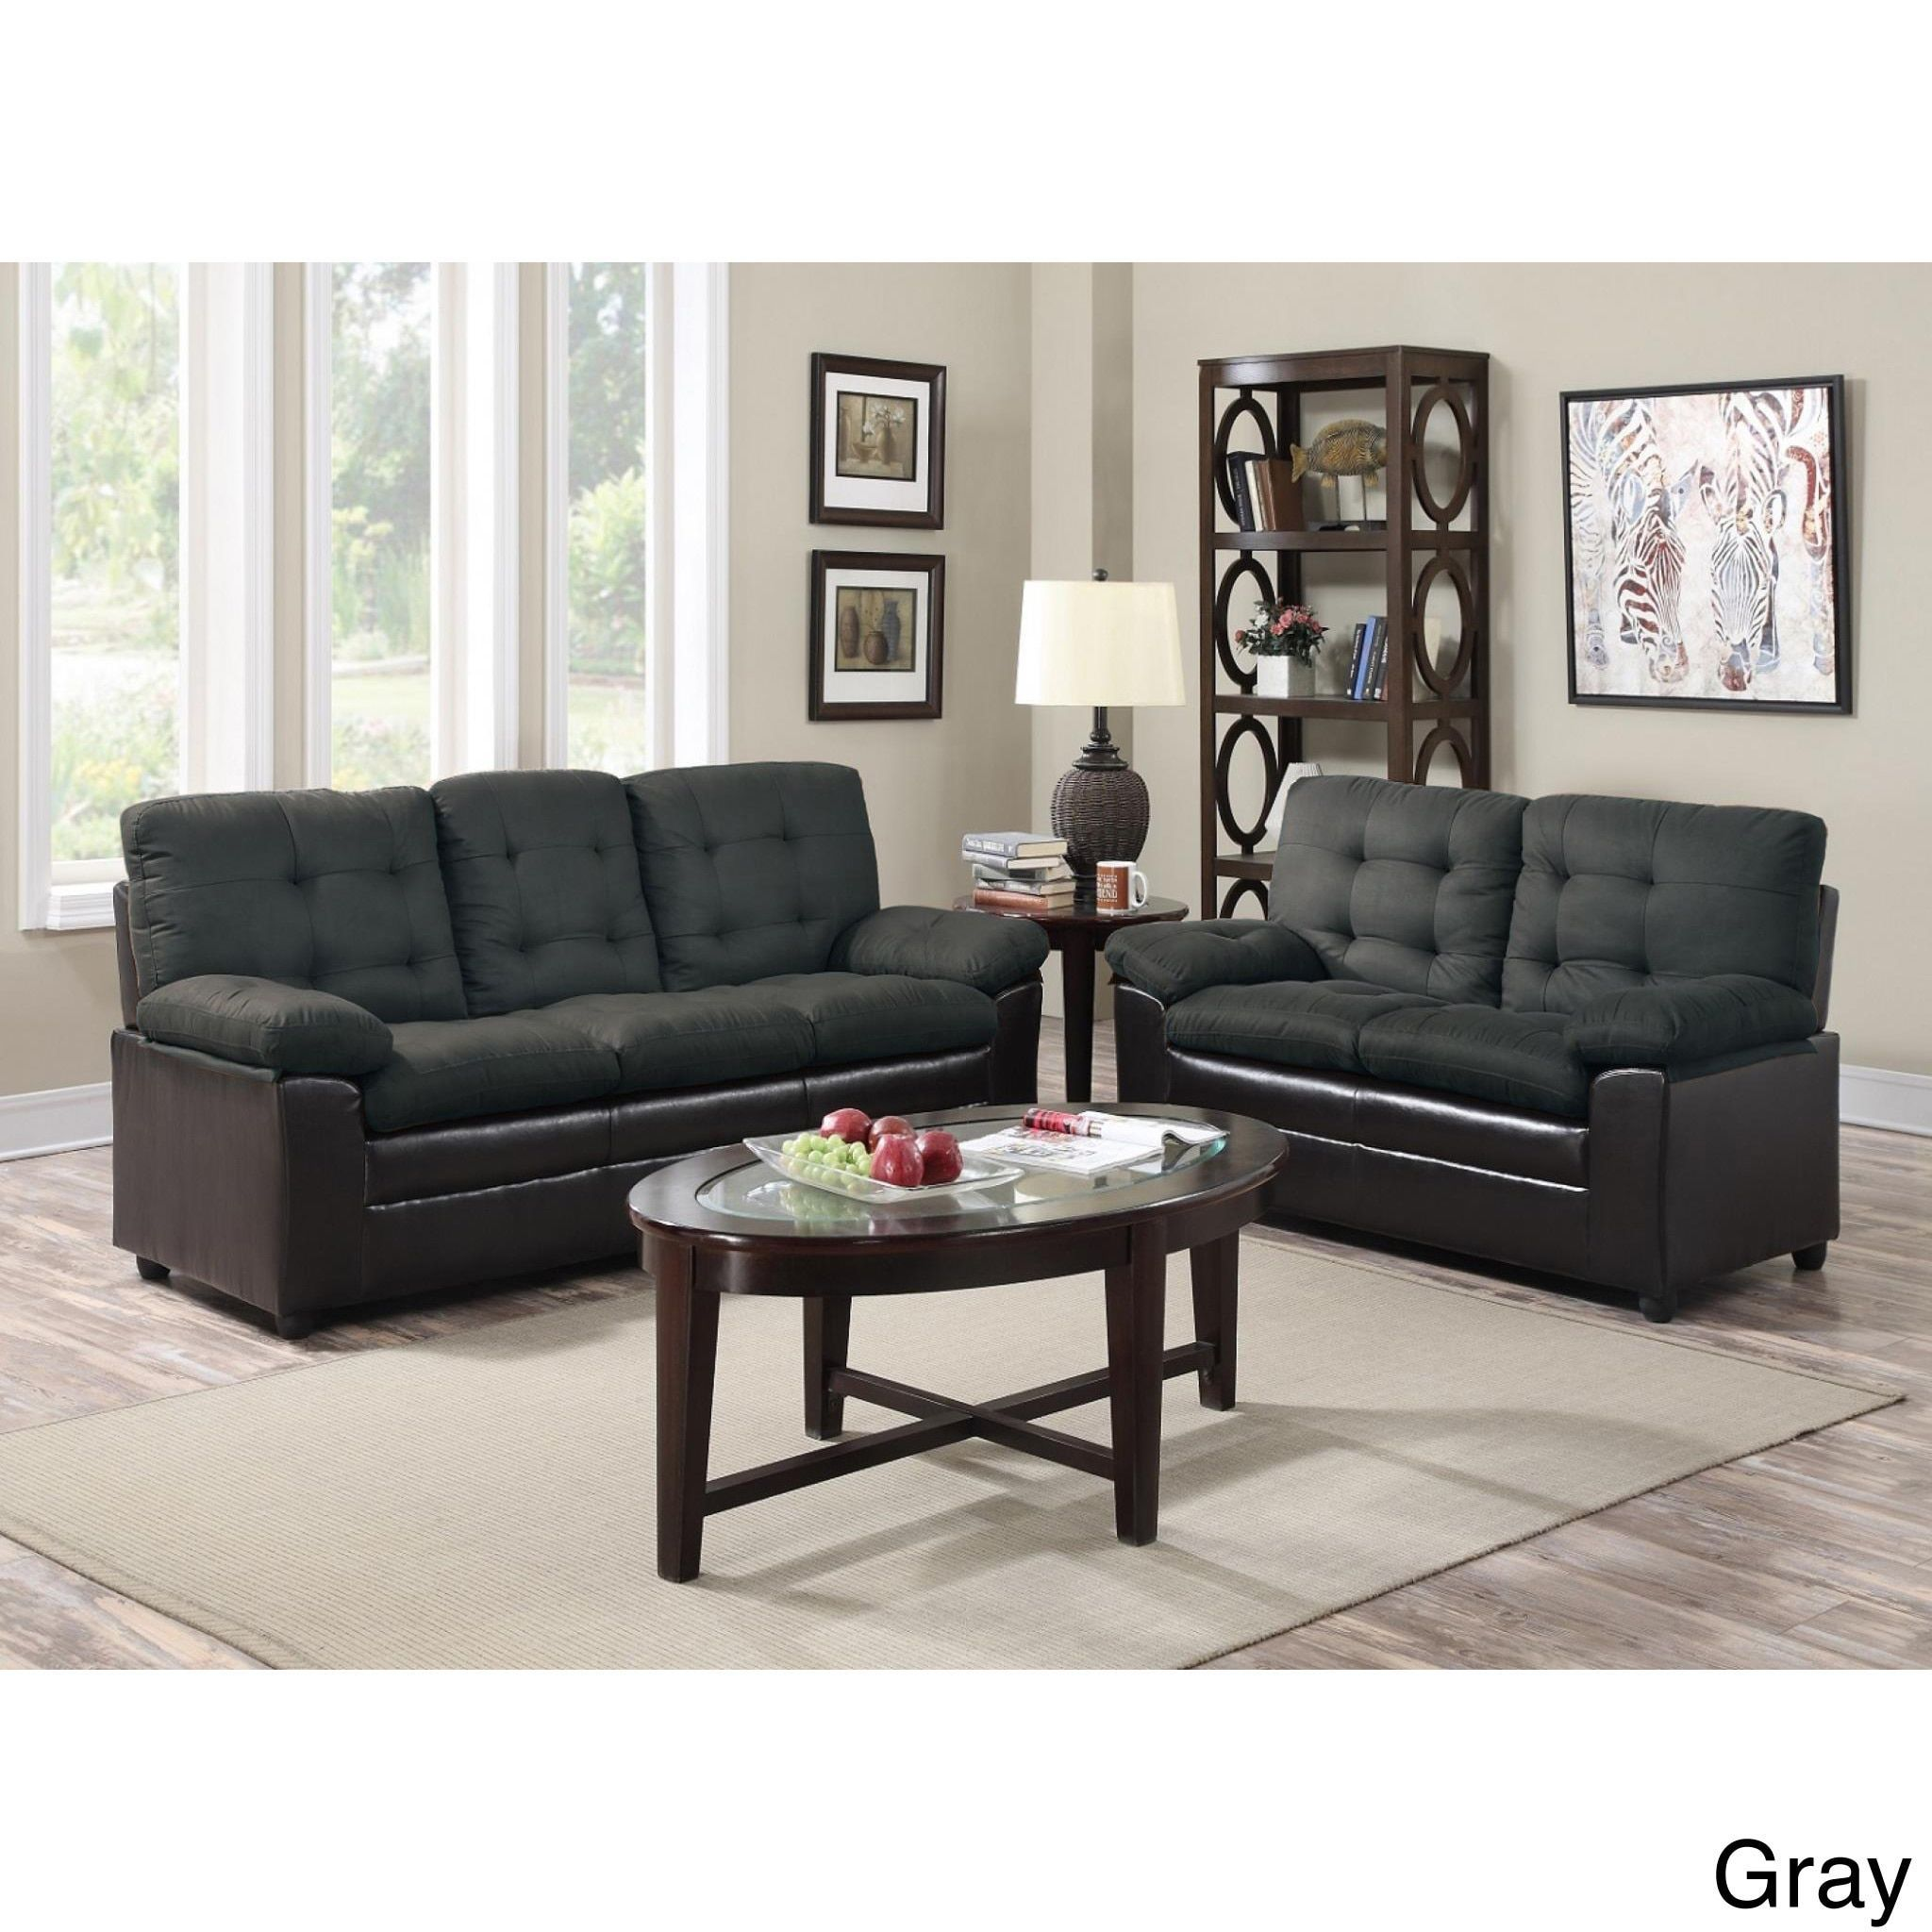 Two Tone Microfiber Sofa and Loveseat Set